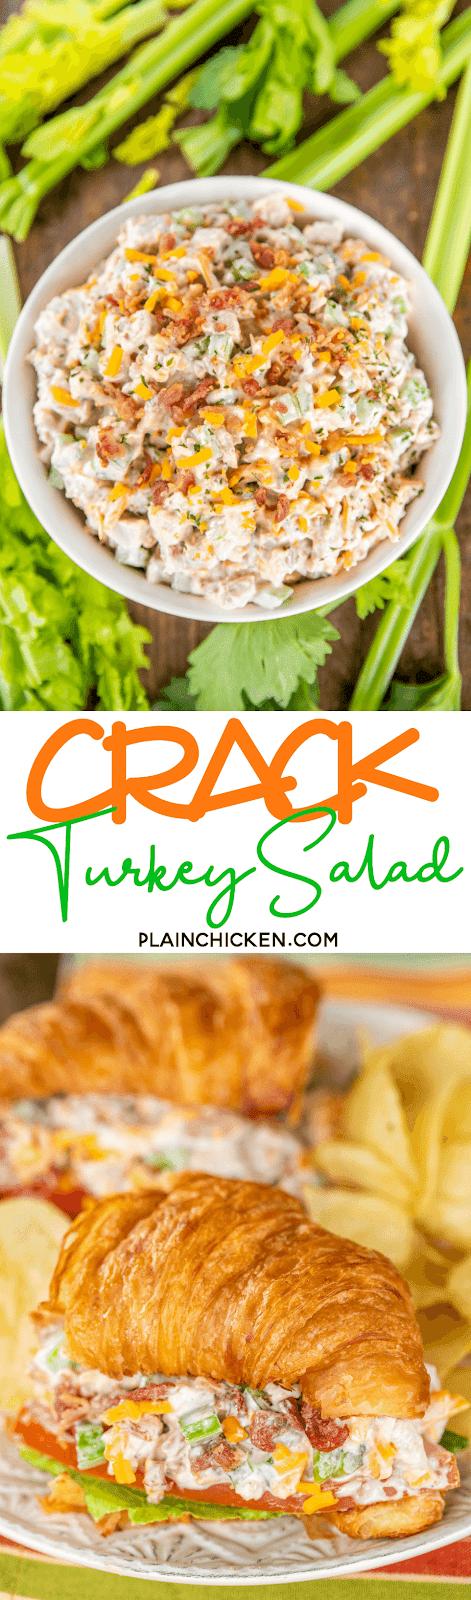 collage of 2 photos of turkey salad